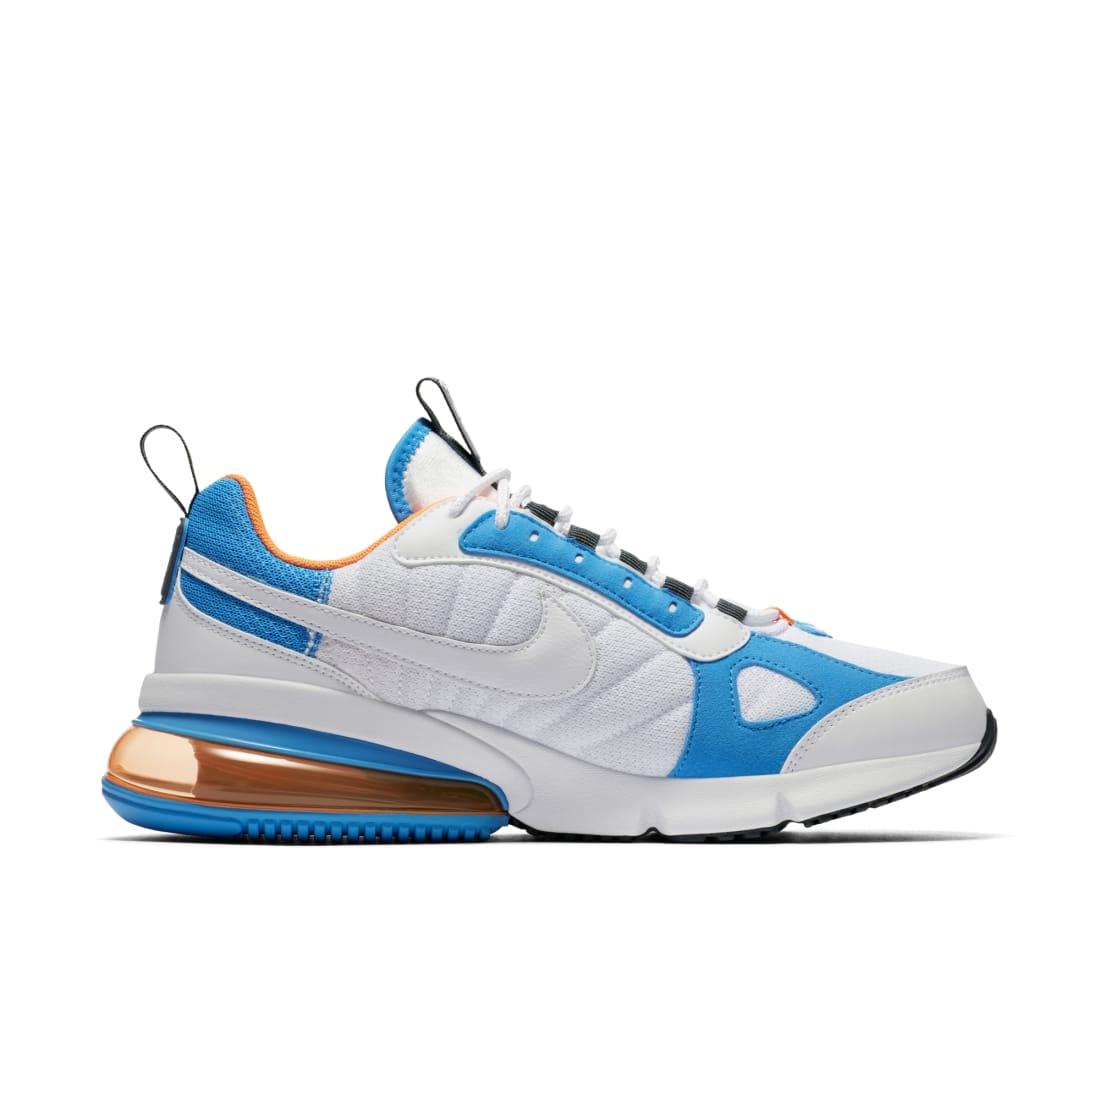 Nike Air Max 270 Futura White Total Orange Blue Heron Nike